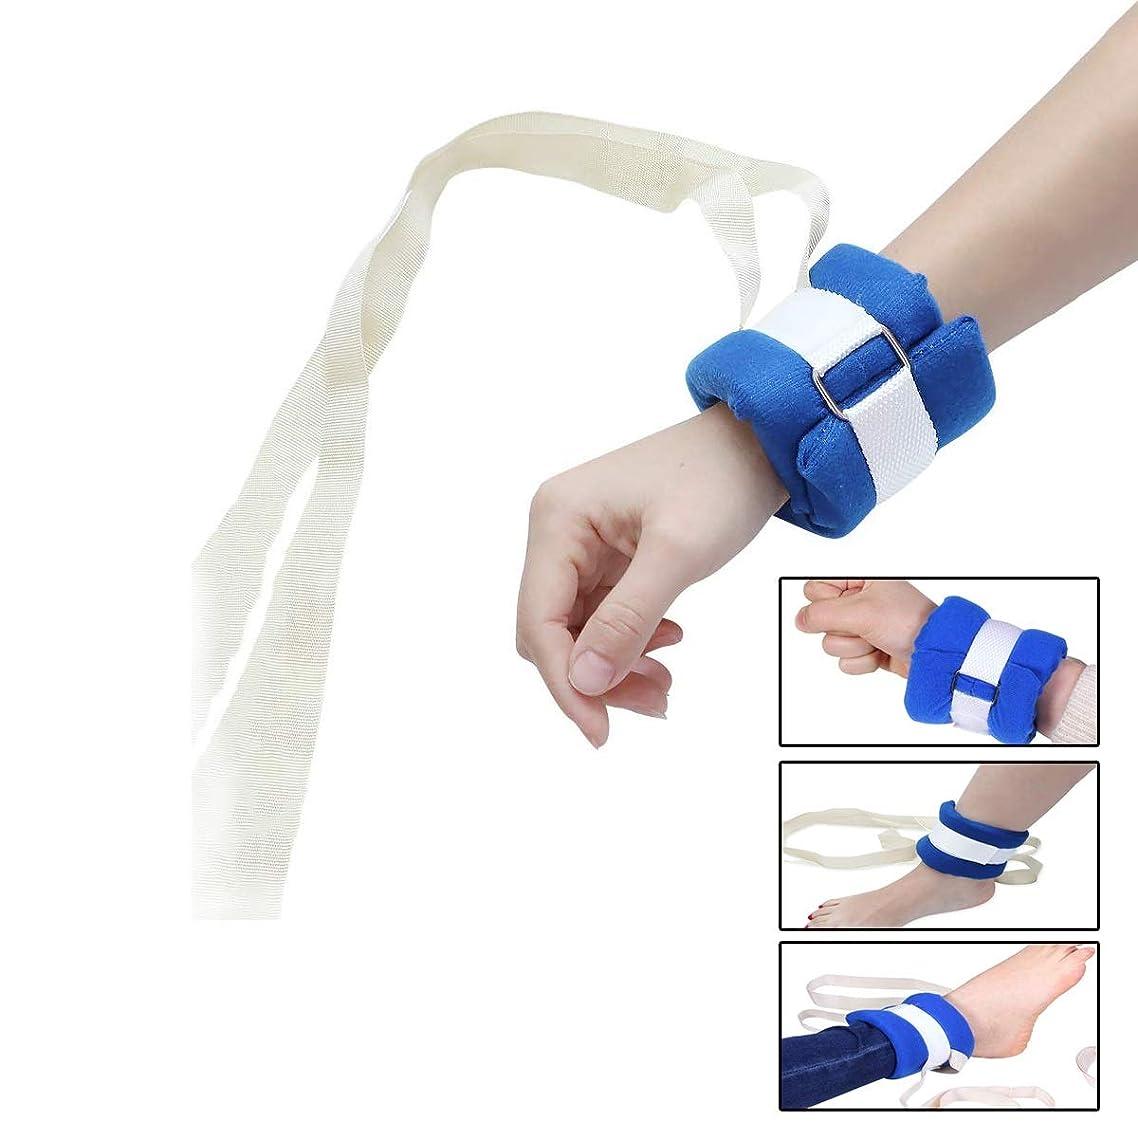 YxnGu Adjustable Limb Holders for Hands or Feet - Elderly Dementia Universal Constraints Control - Quick Release Limb Holders(1 Pair)